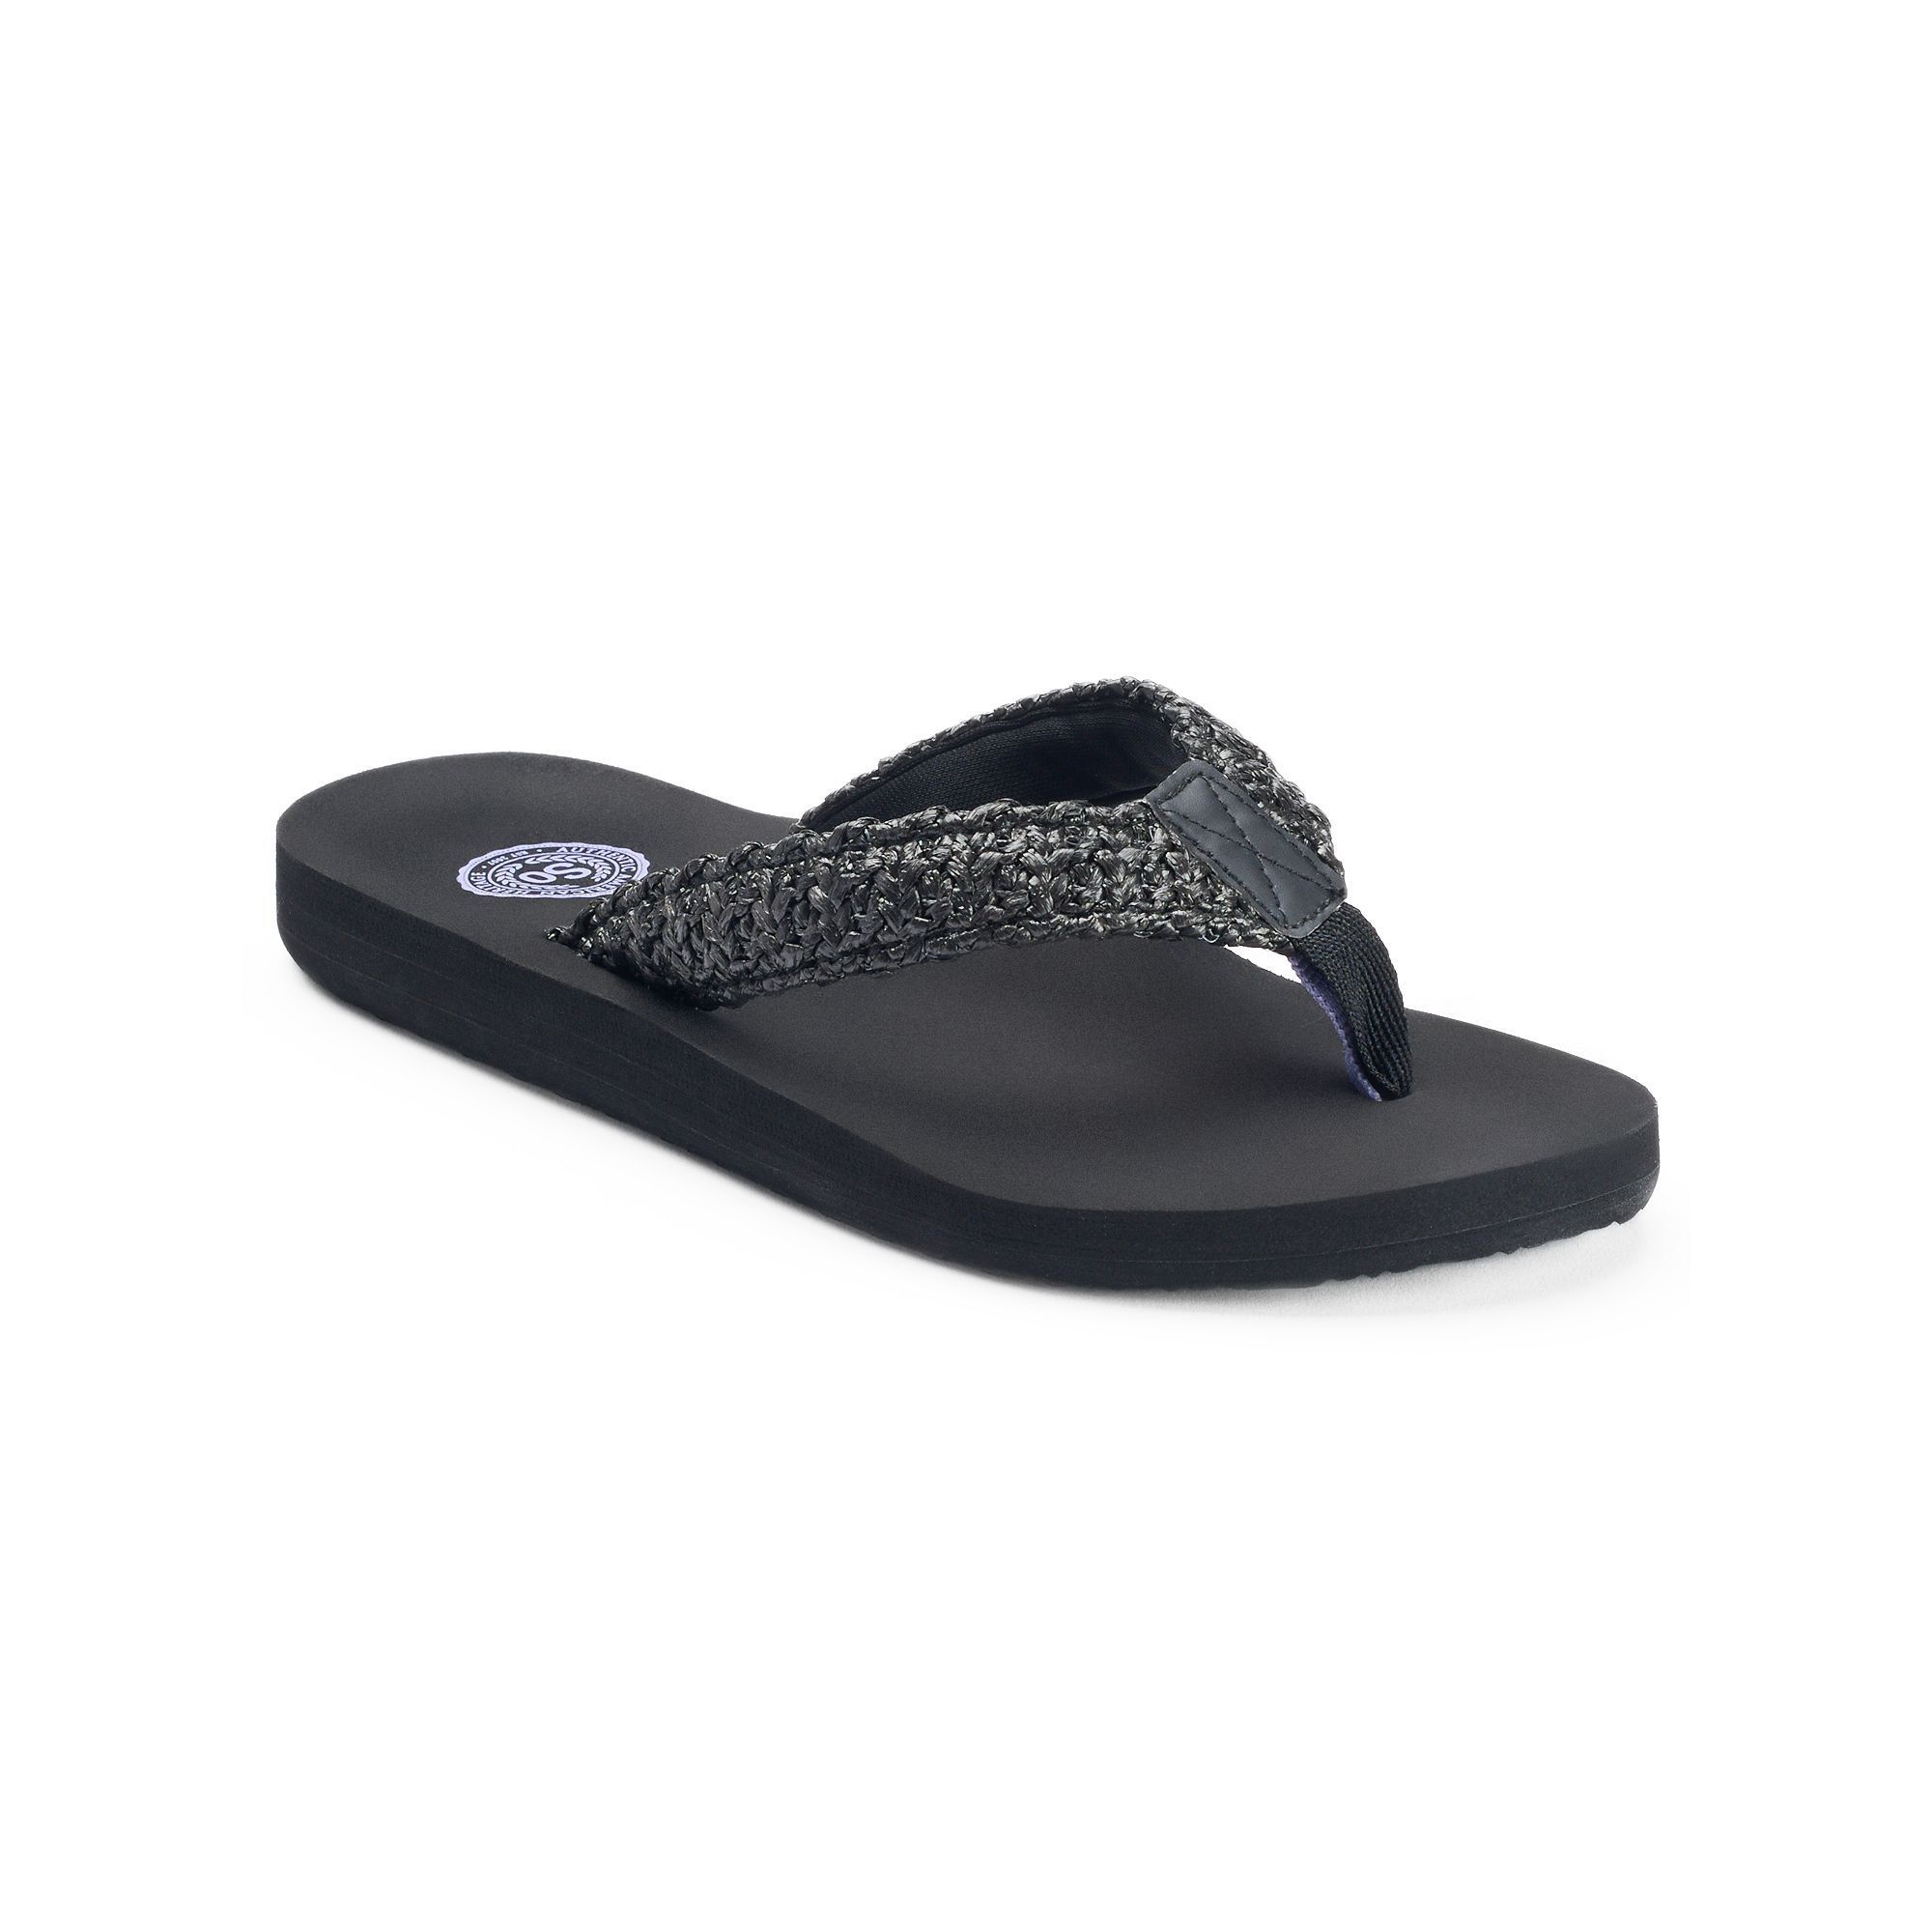 mat snuk women flip fashion sandals sanuk mats flop womens s yoga